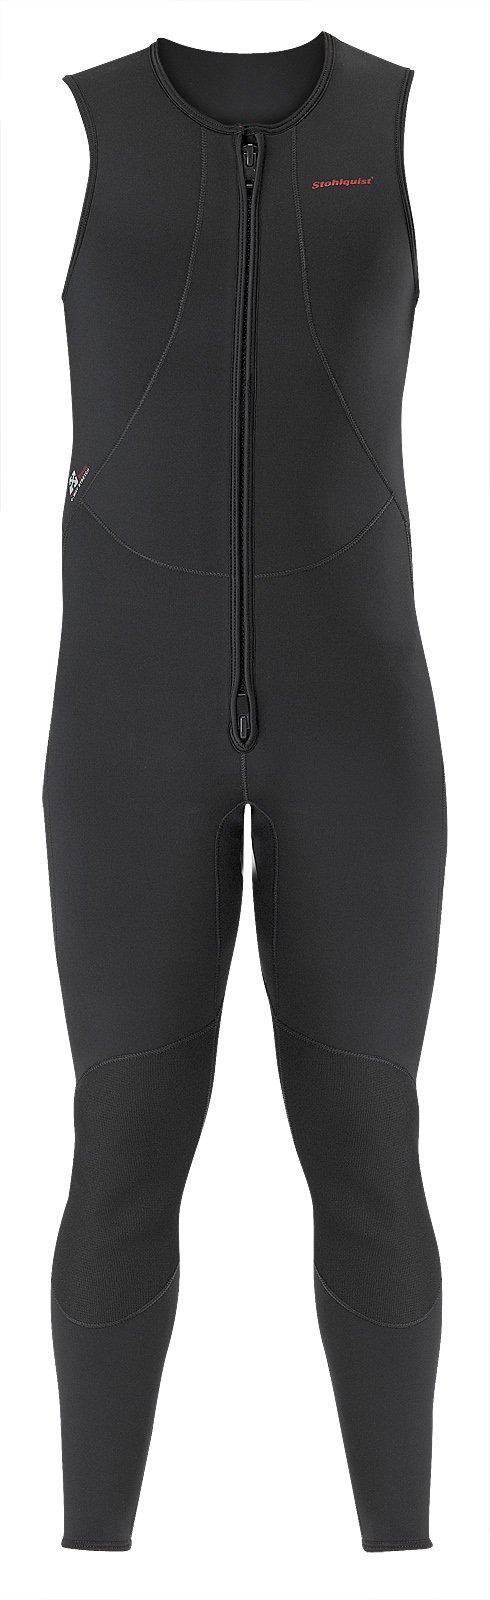 Stohlquist Men's Rapid John Wetsuit, Black, 3X-Large